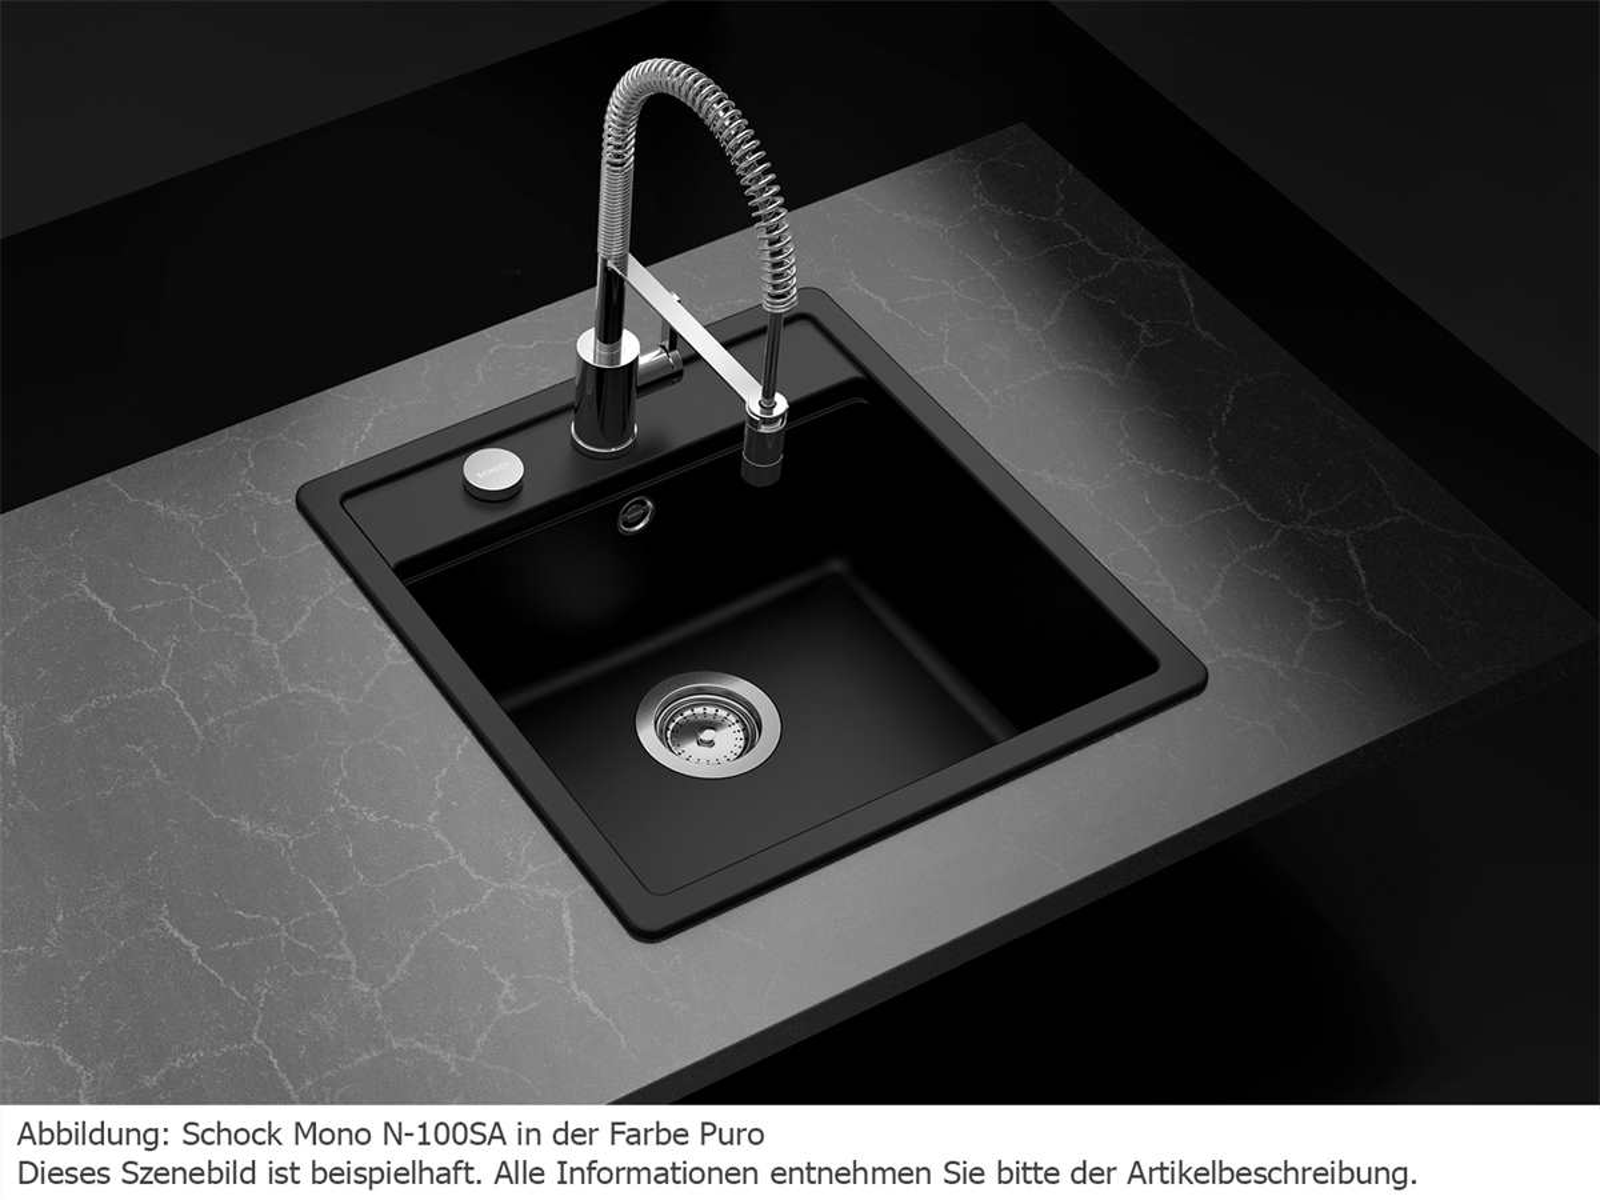 Schock Mono N-100S A Carbonium - MONN100SACAR Granitspüle